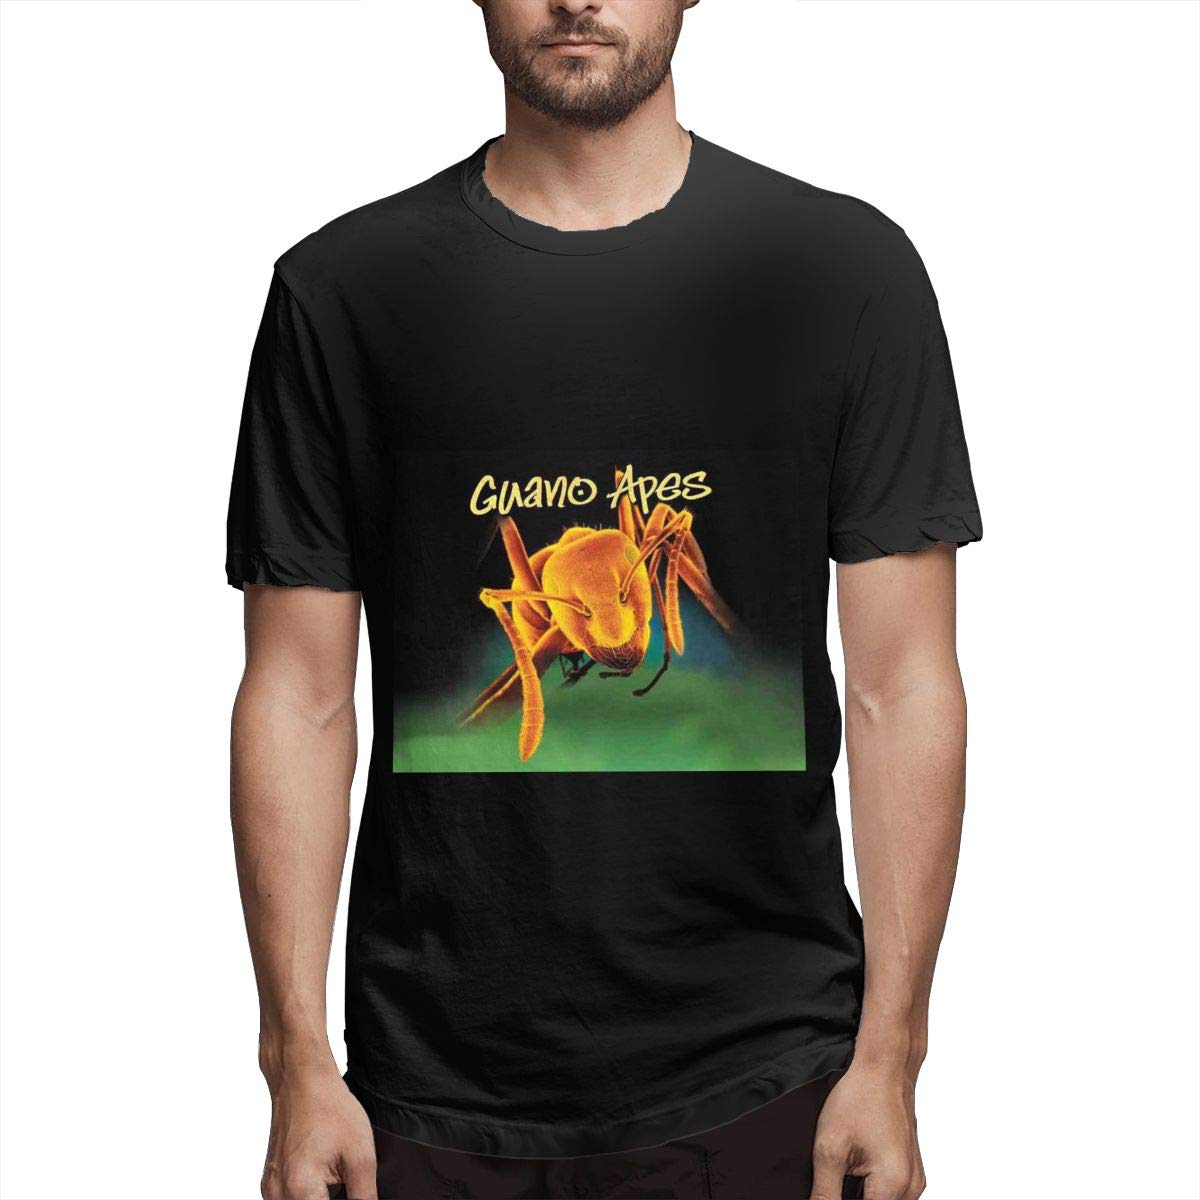 Lihehen S Guano Apes Round Neck T Shirt